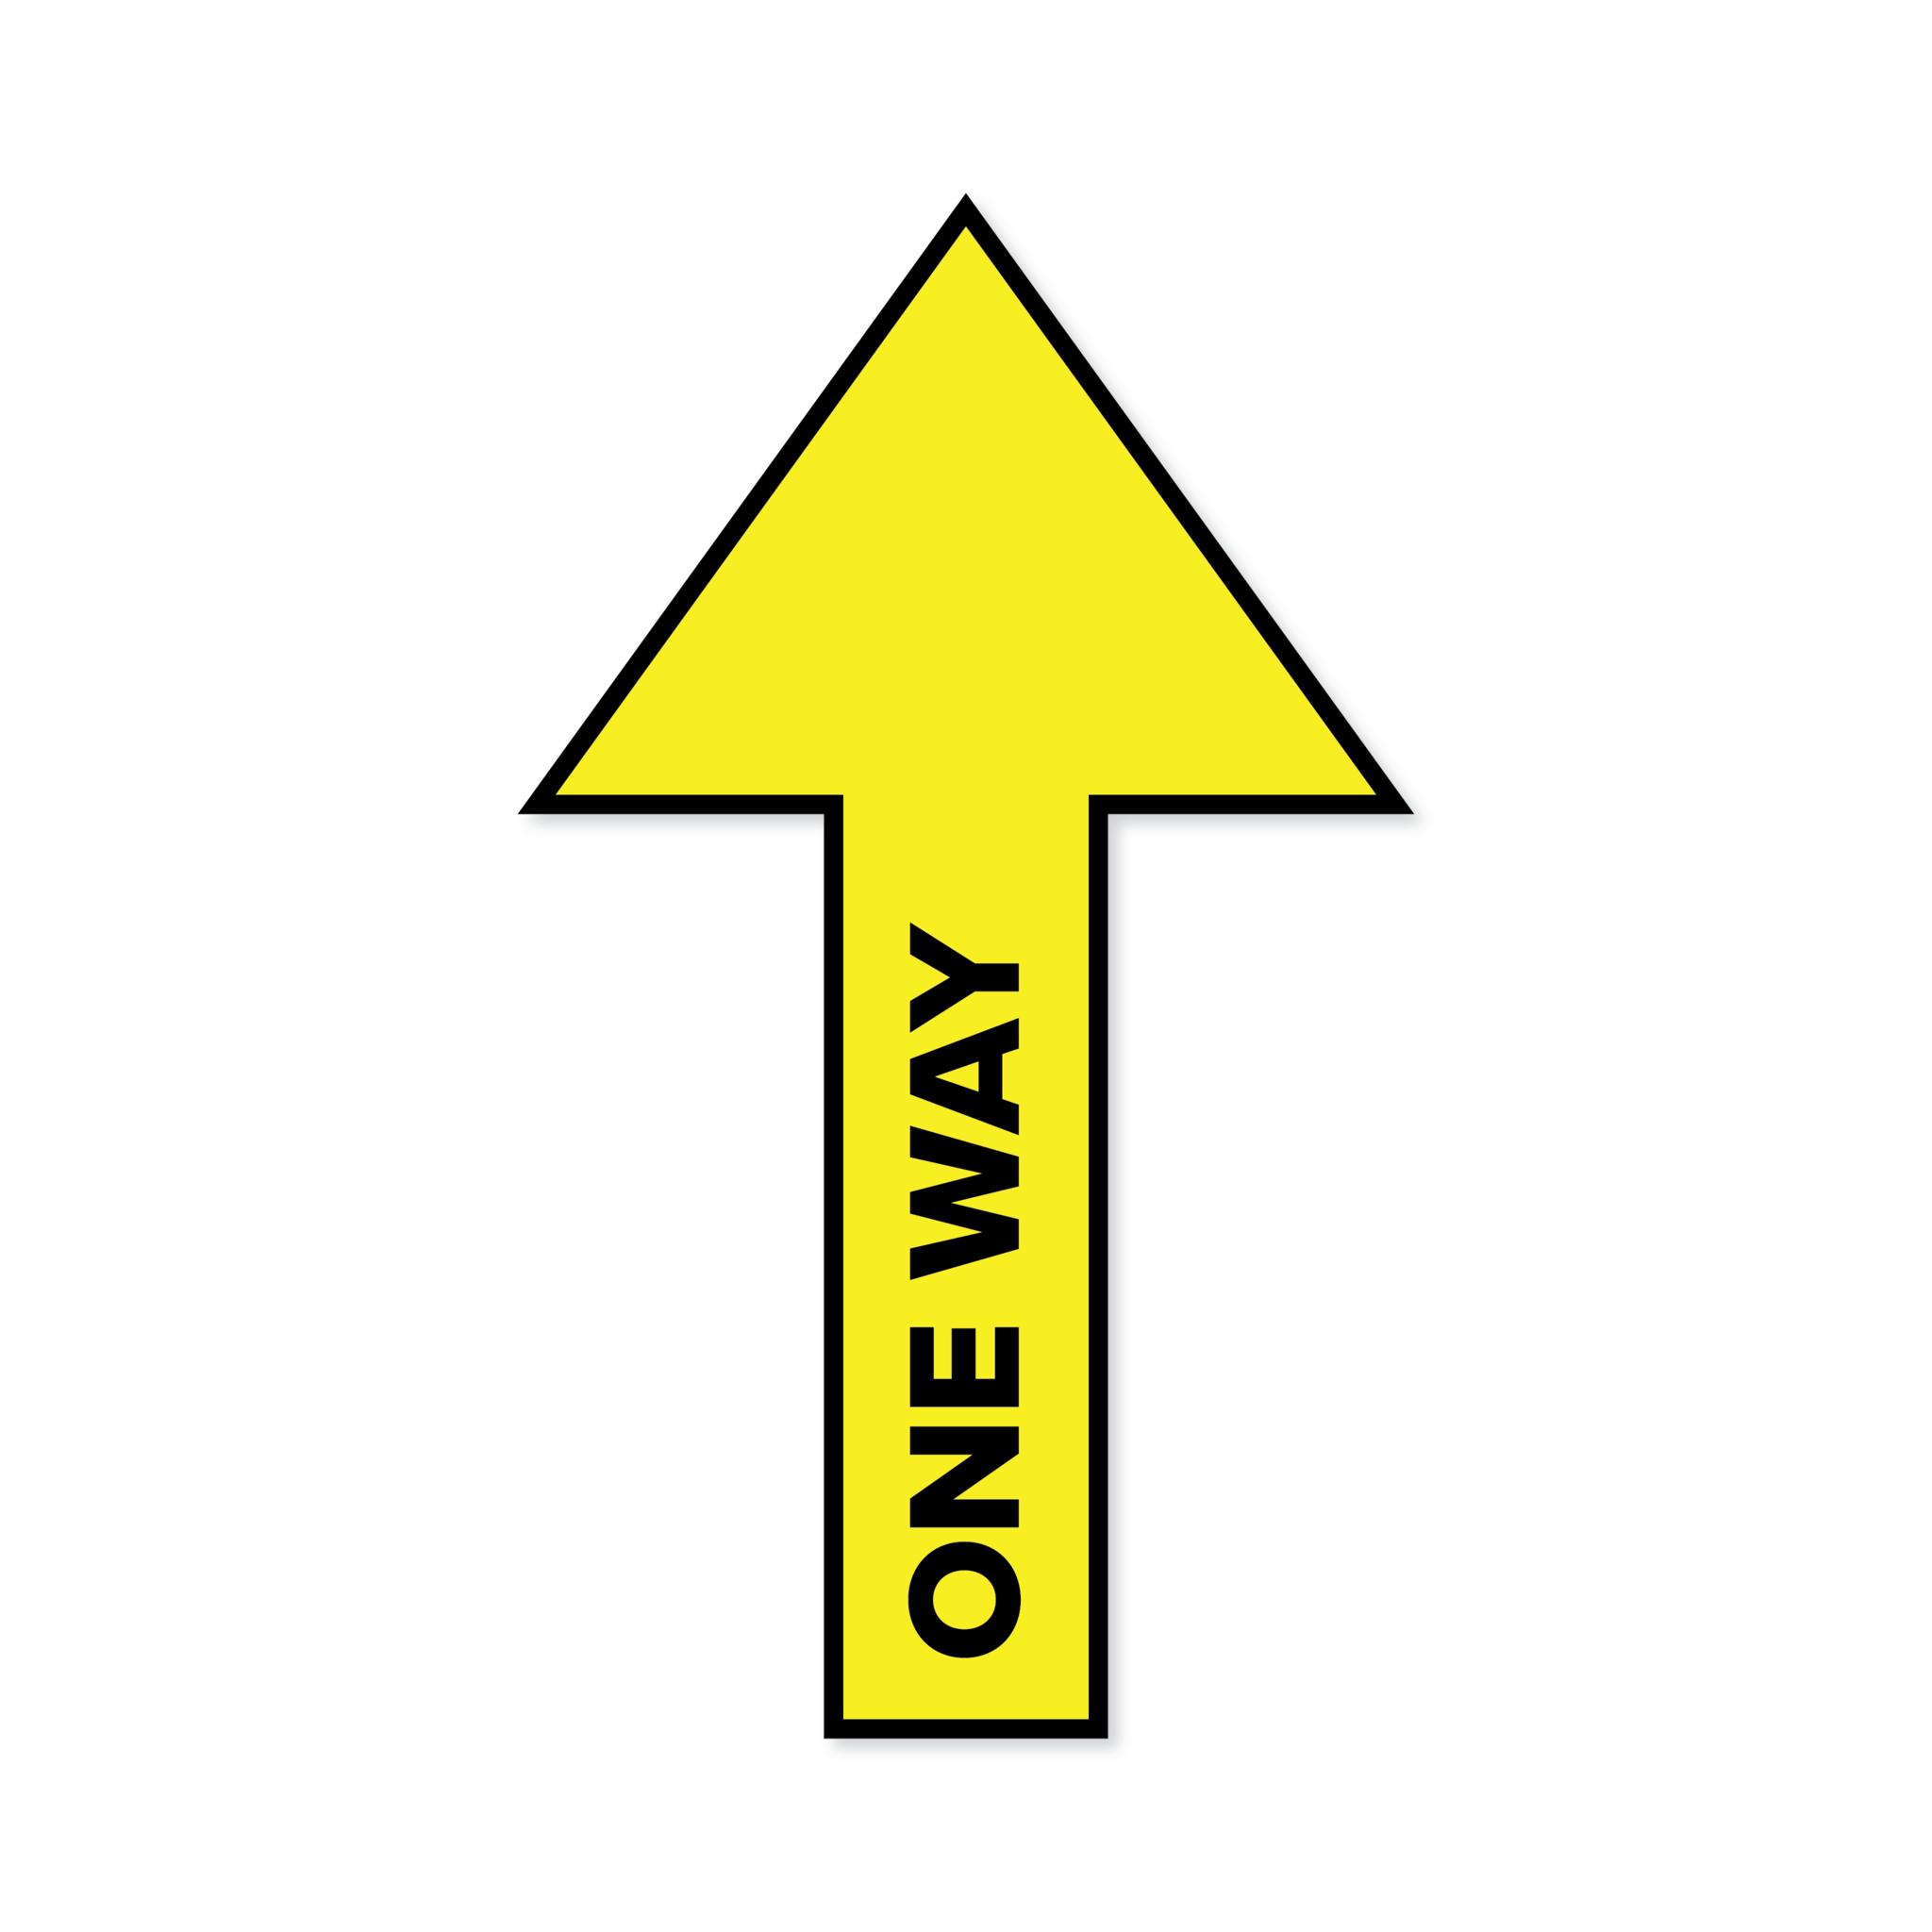 Vinilo adhesivo arrow One Way